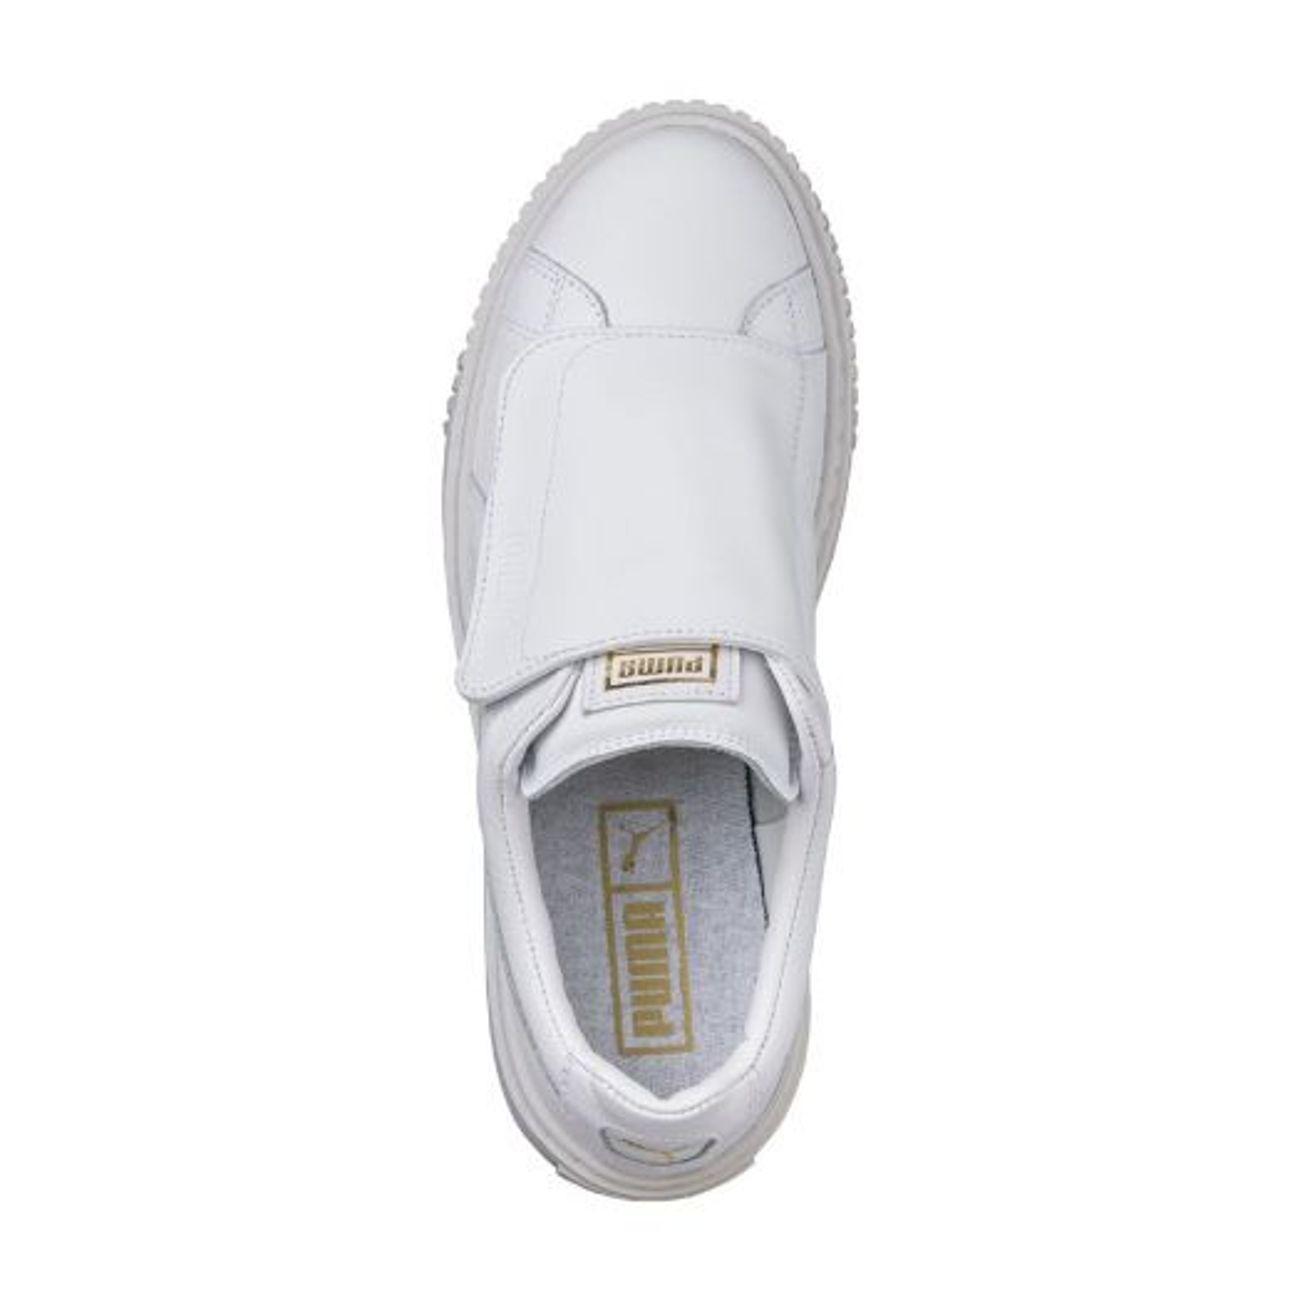 d4a27bd1cb6 ... Mode- Lifestyle femme PUMA Chaussures Puma Basket Platform Big Velcro  Blanc